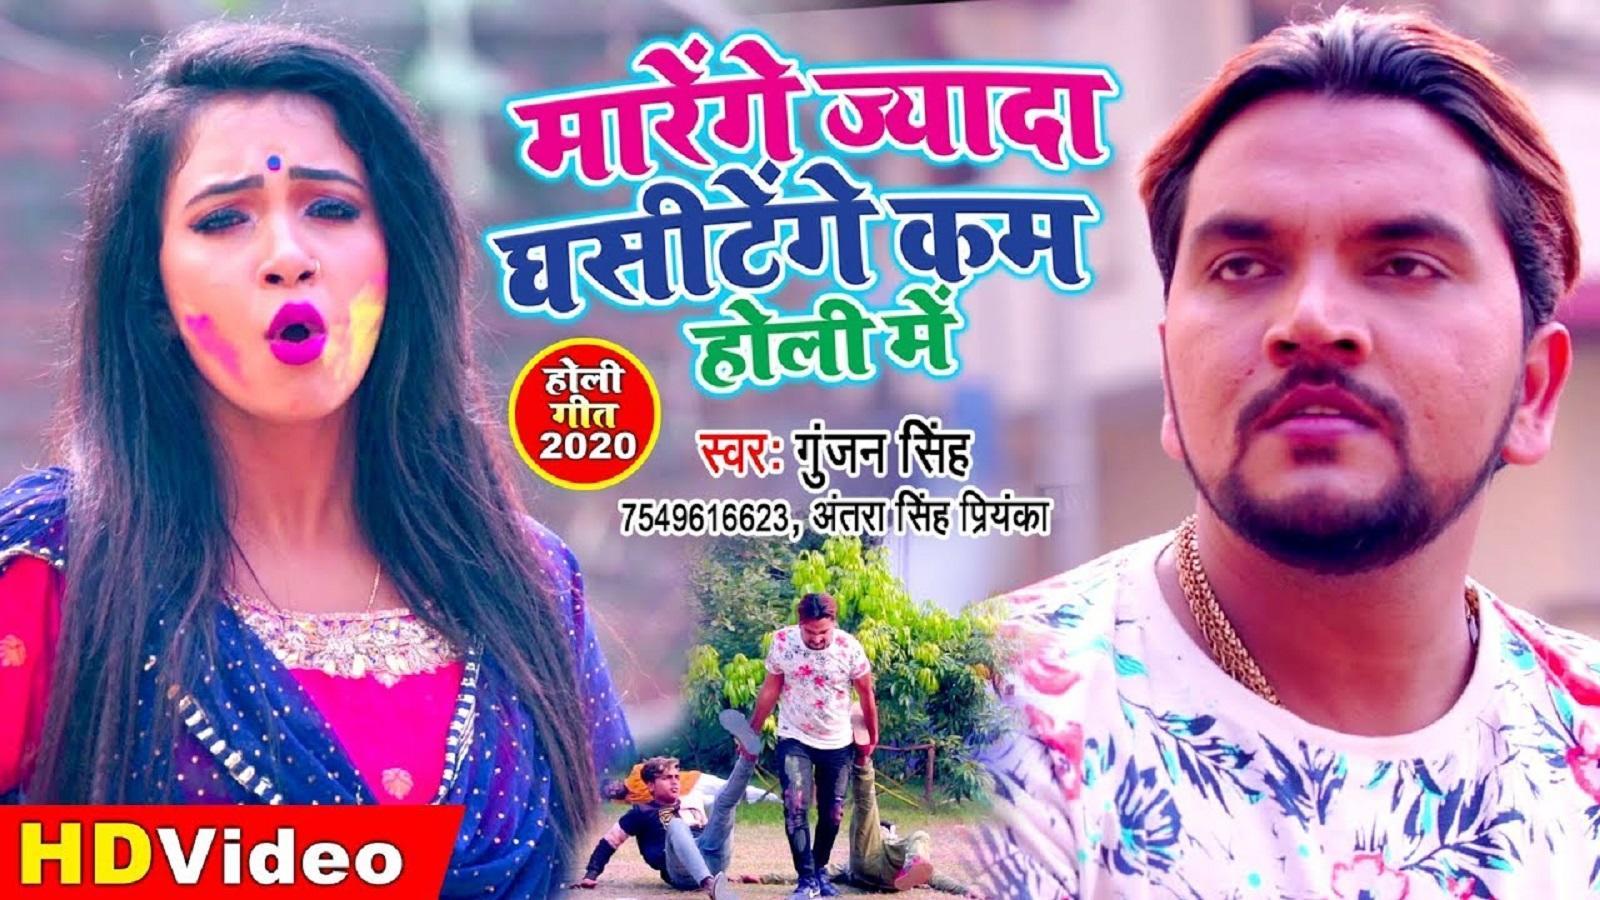 New Bhojpuri Song Videos Gunjan Singh And Antra Singh Priyanka S Latest Bhojouri Song Marenge Jayda Ghasitenge Kam Holi Me Bhojpuri Video Songs Times Of India